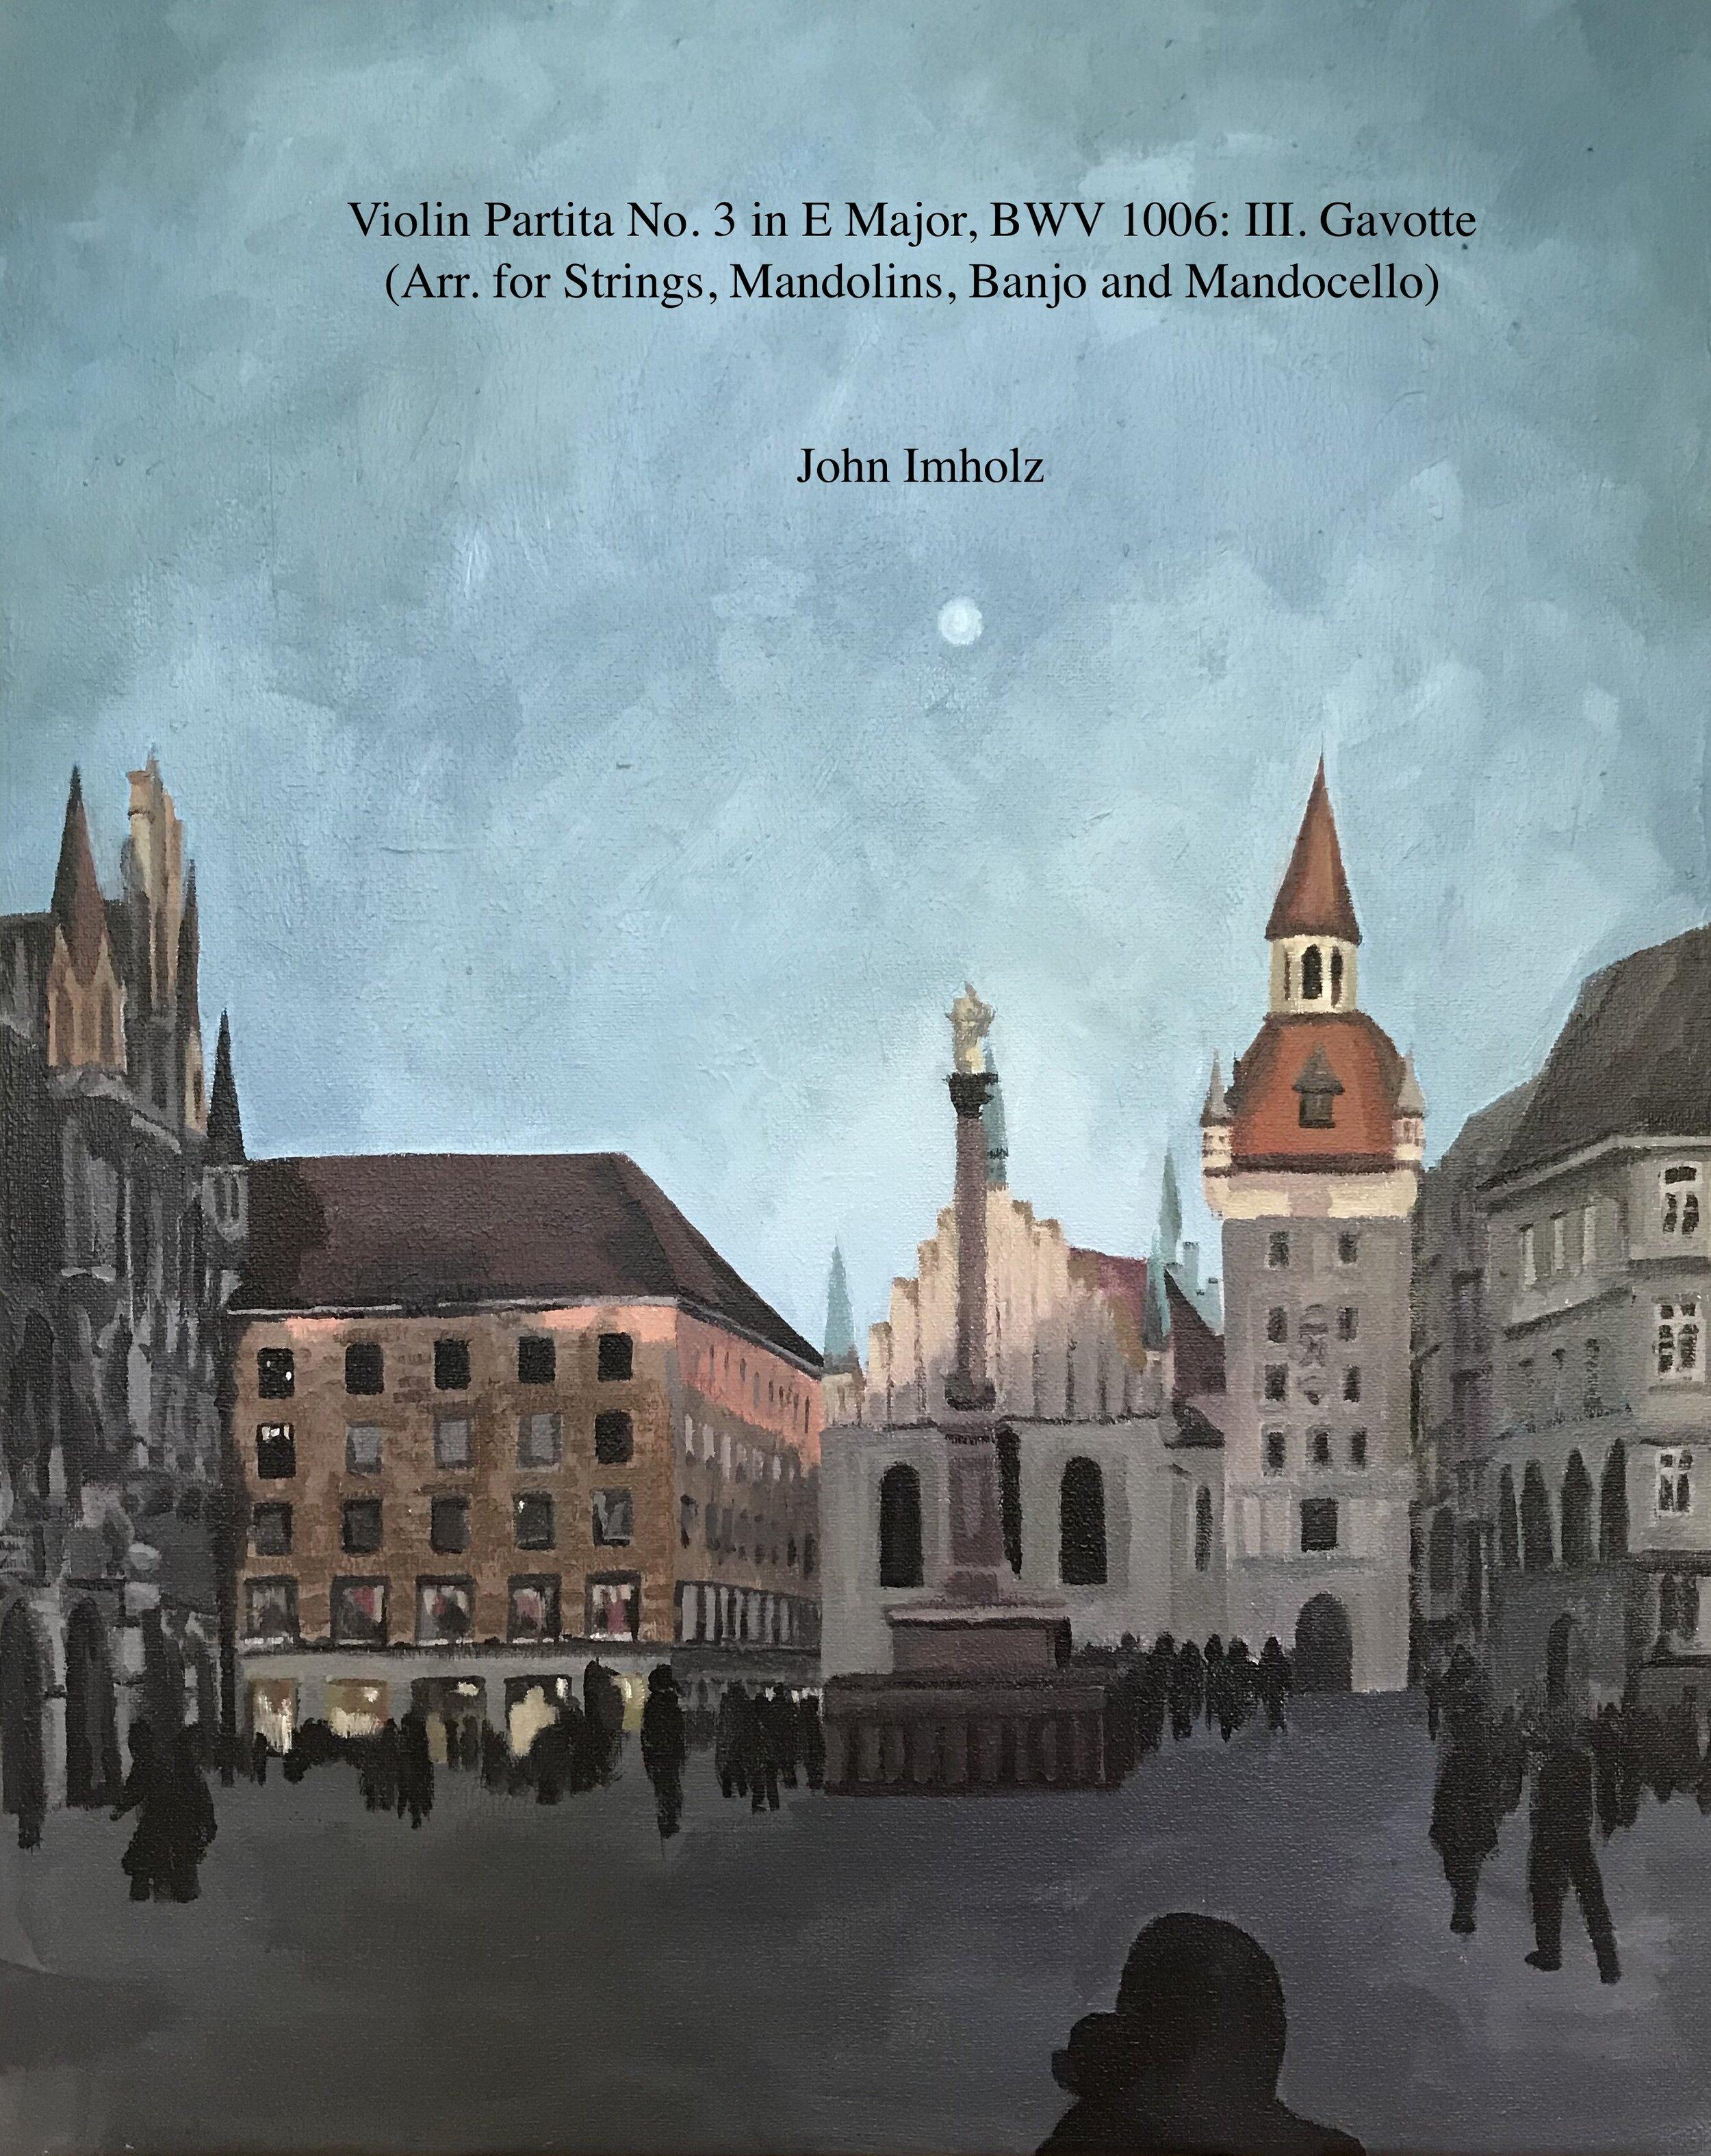 Marienplatz, München - 17. April 2019, von Fanya Sandrine Imholz